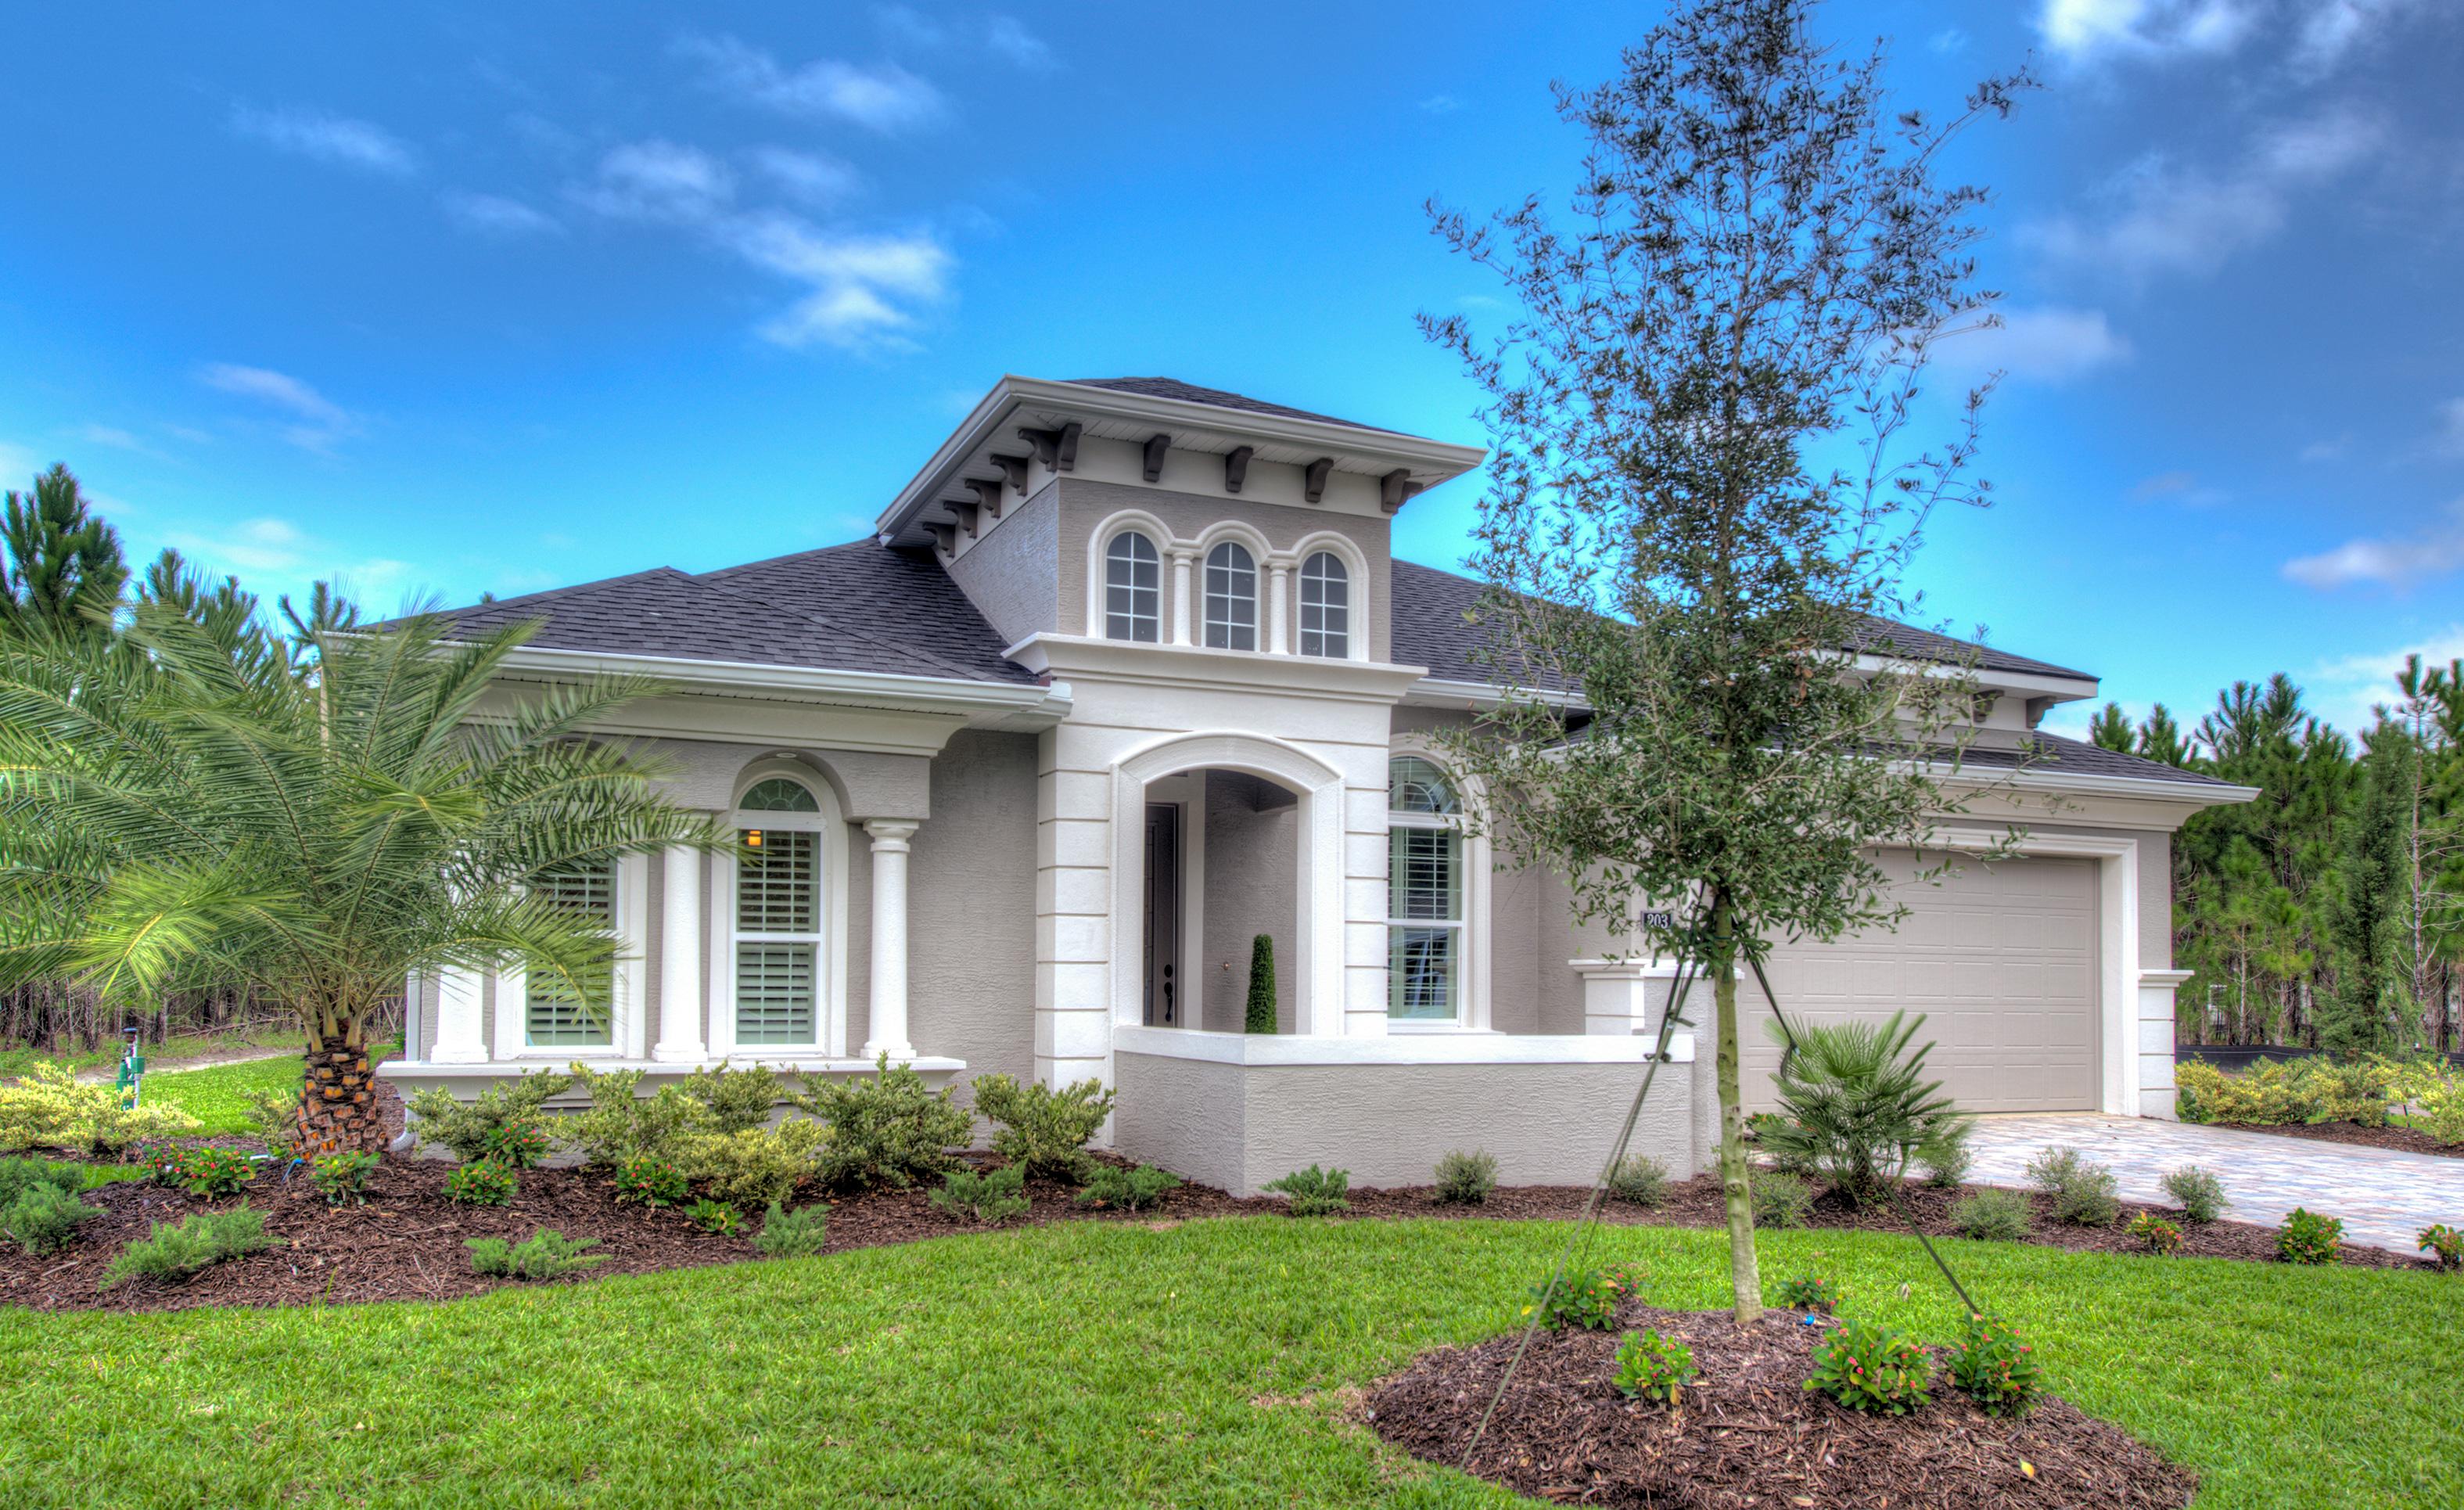 203 Heatherwood Court, Ormond Beach, FL 32174